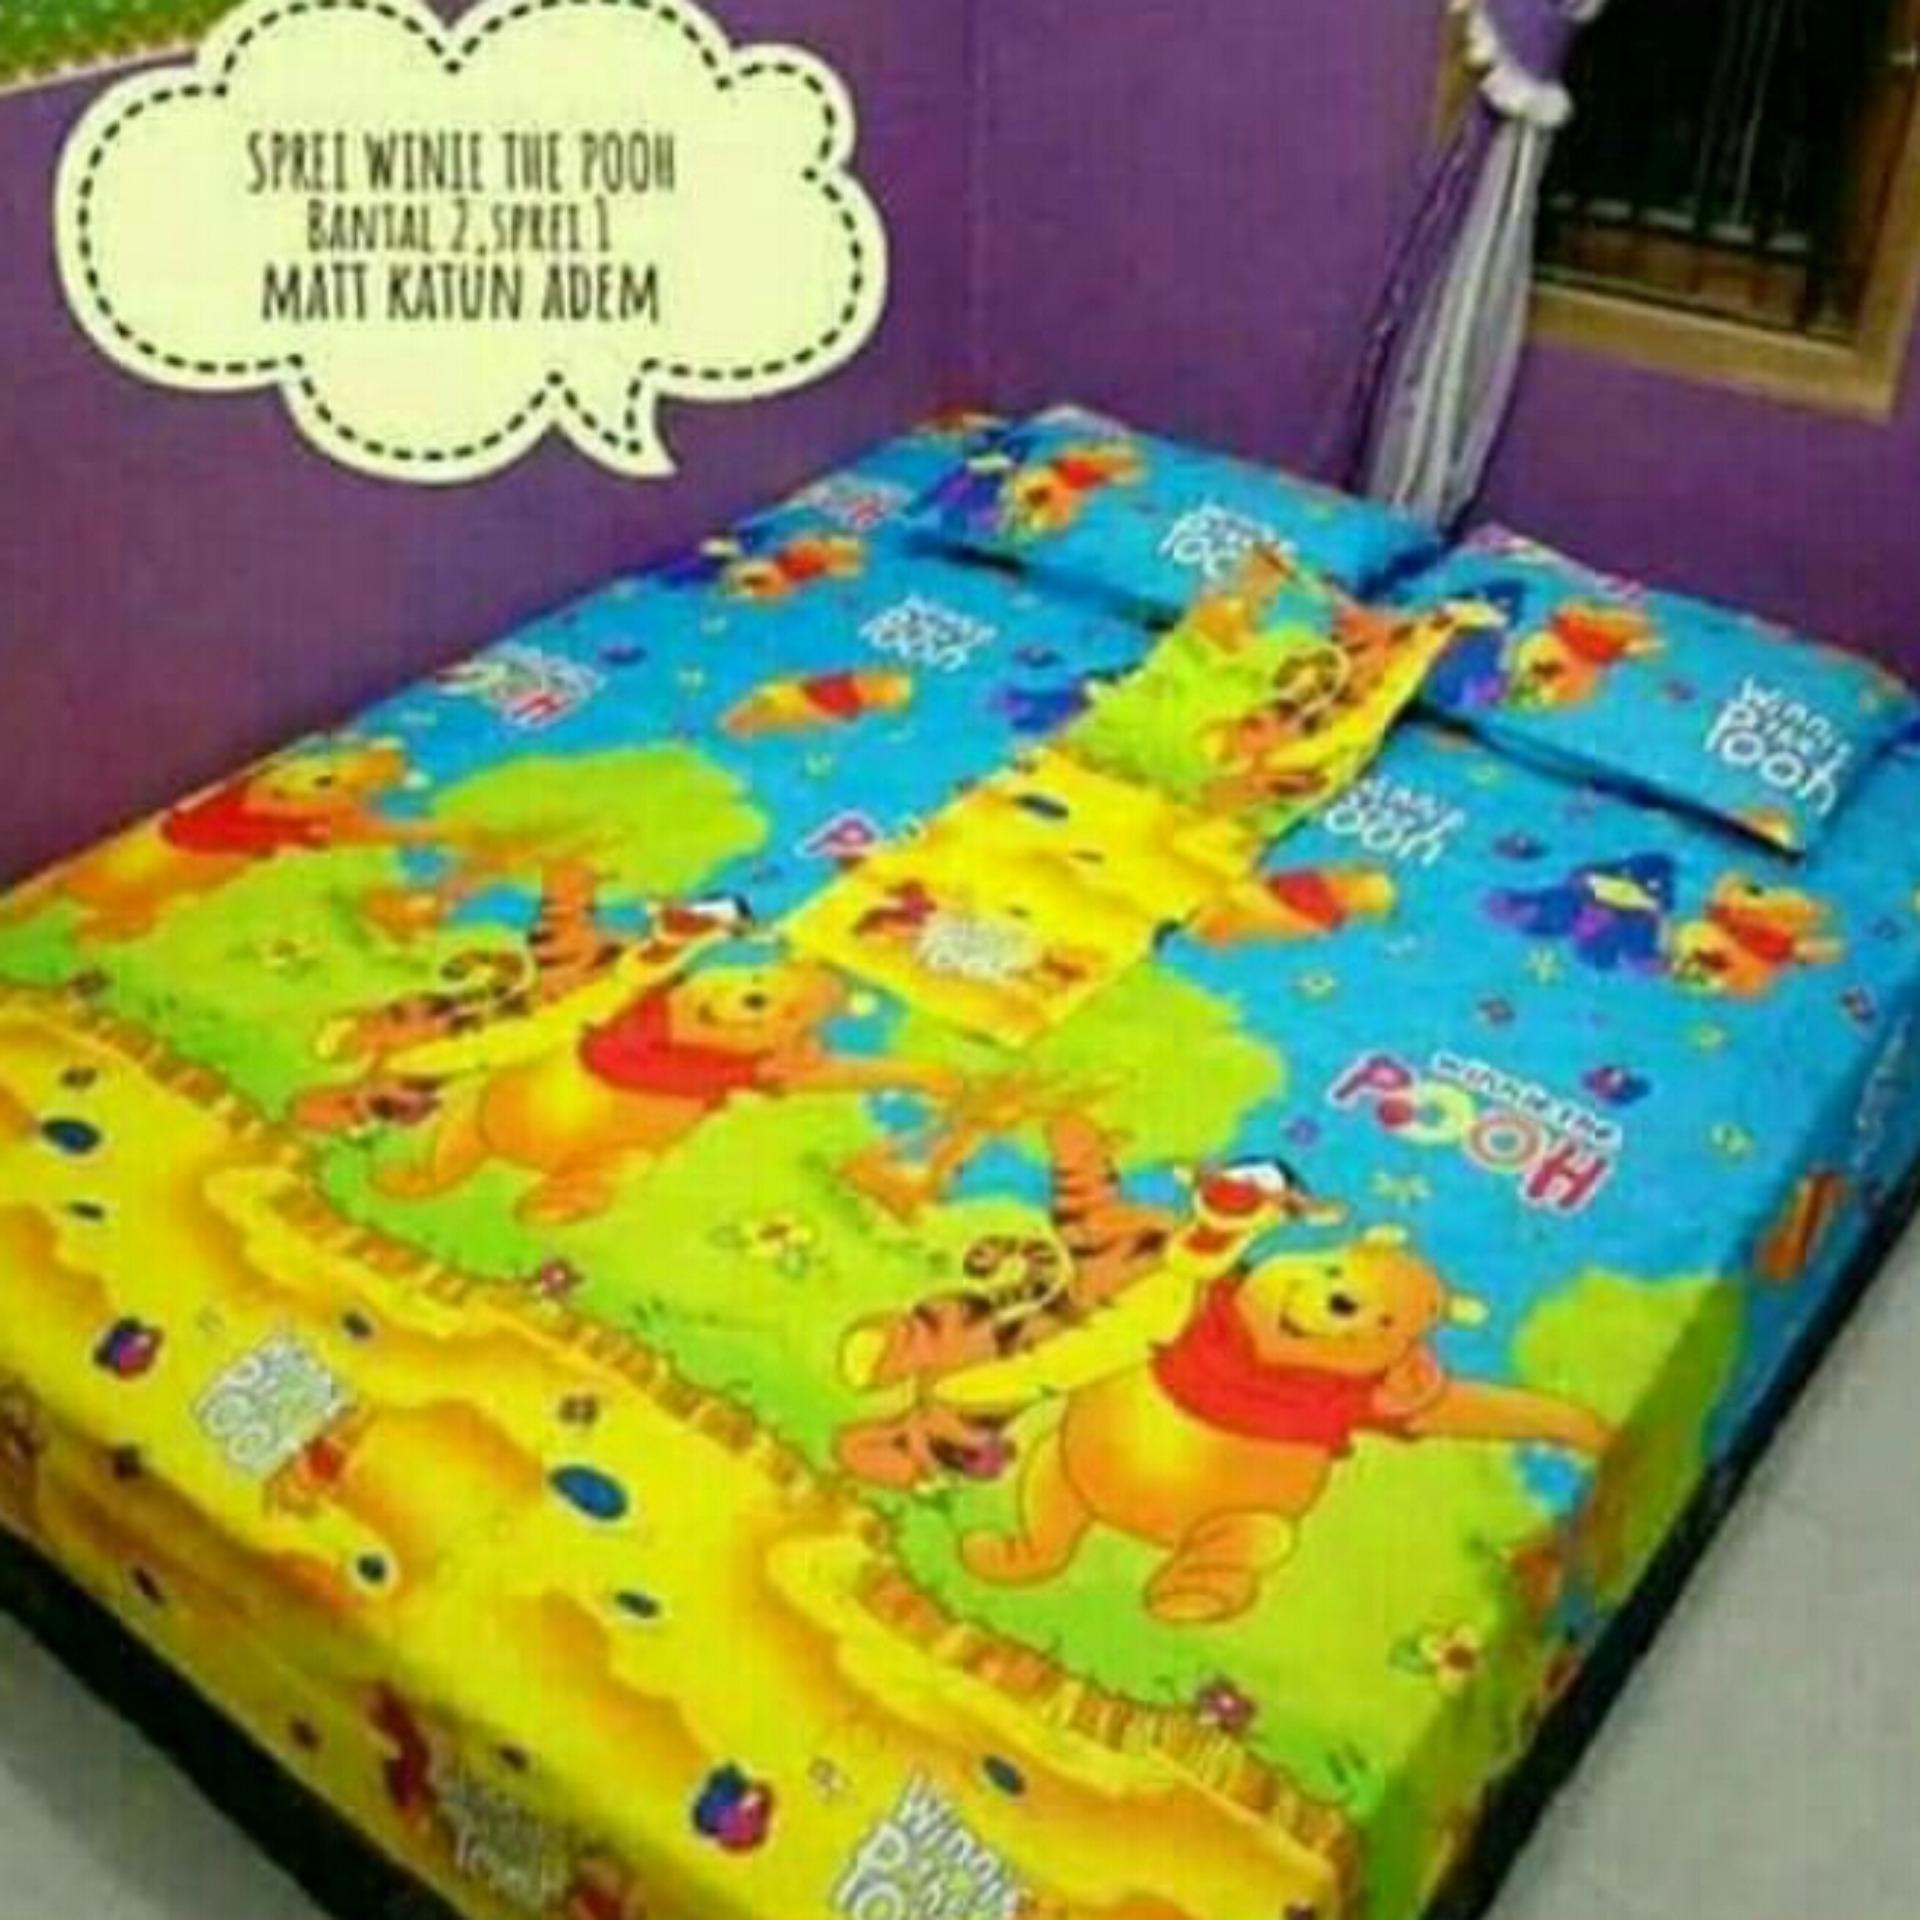 Hot Deals Sprei karakter motif winnie the pooh 200x200x20 terbaik murah - Hanya Rp93.456